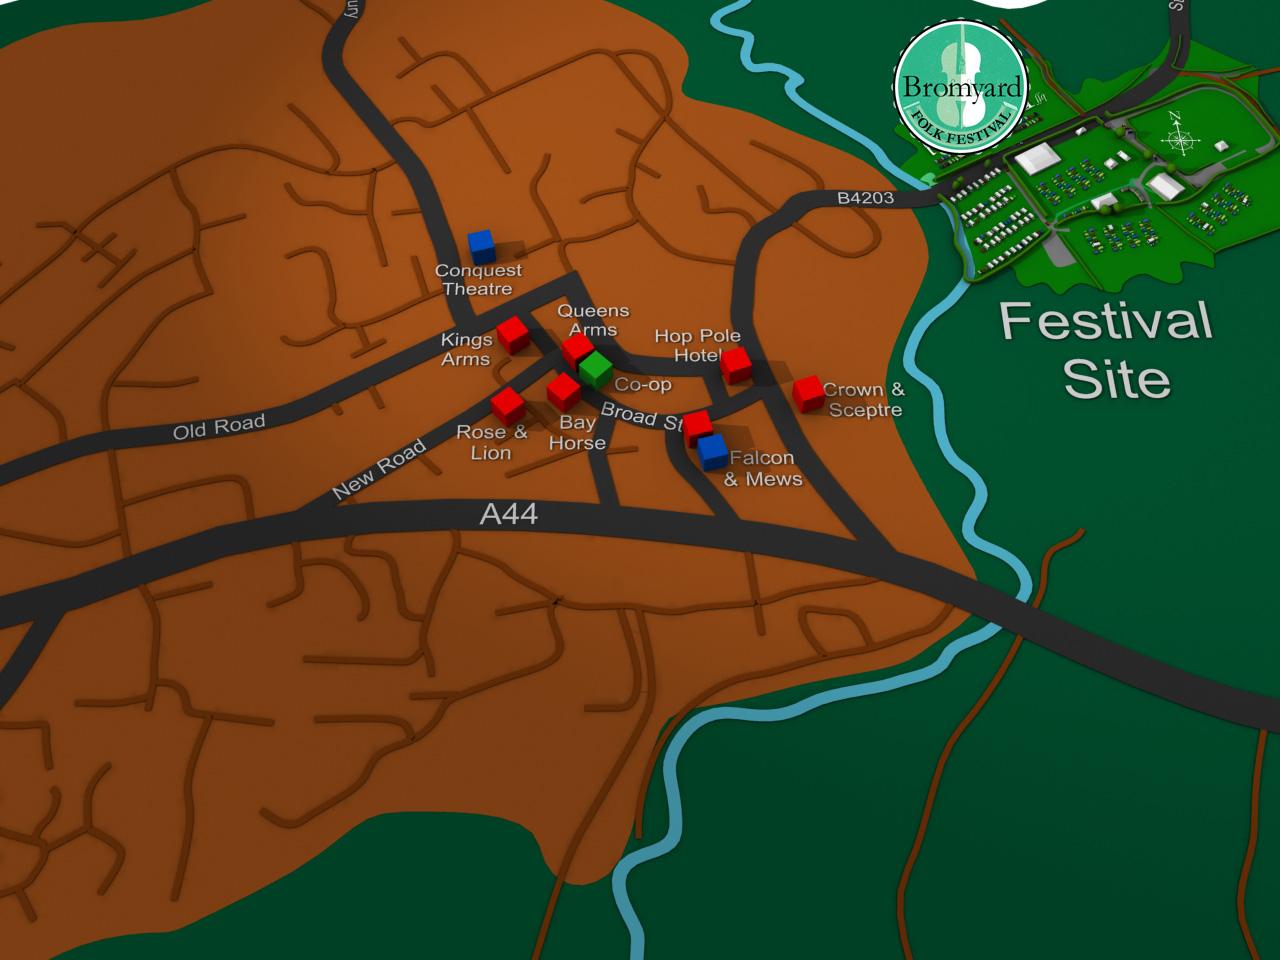 Bromyard Folk Festival Town map